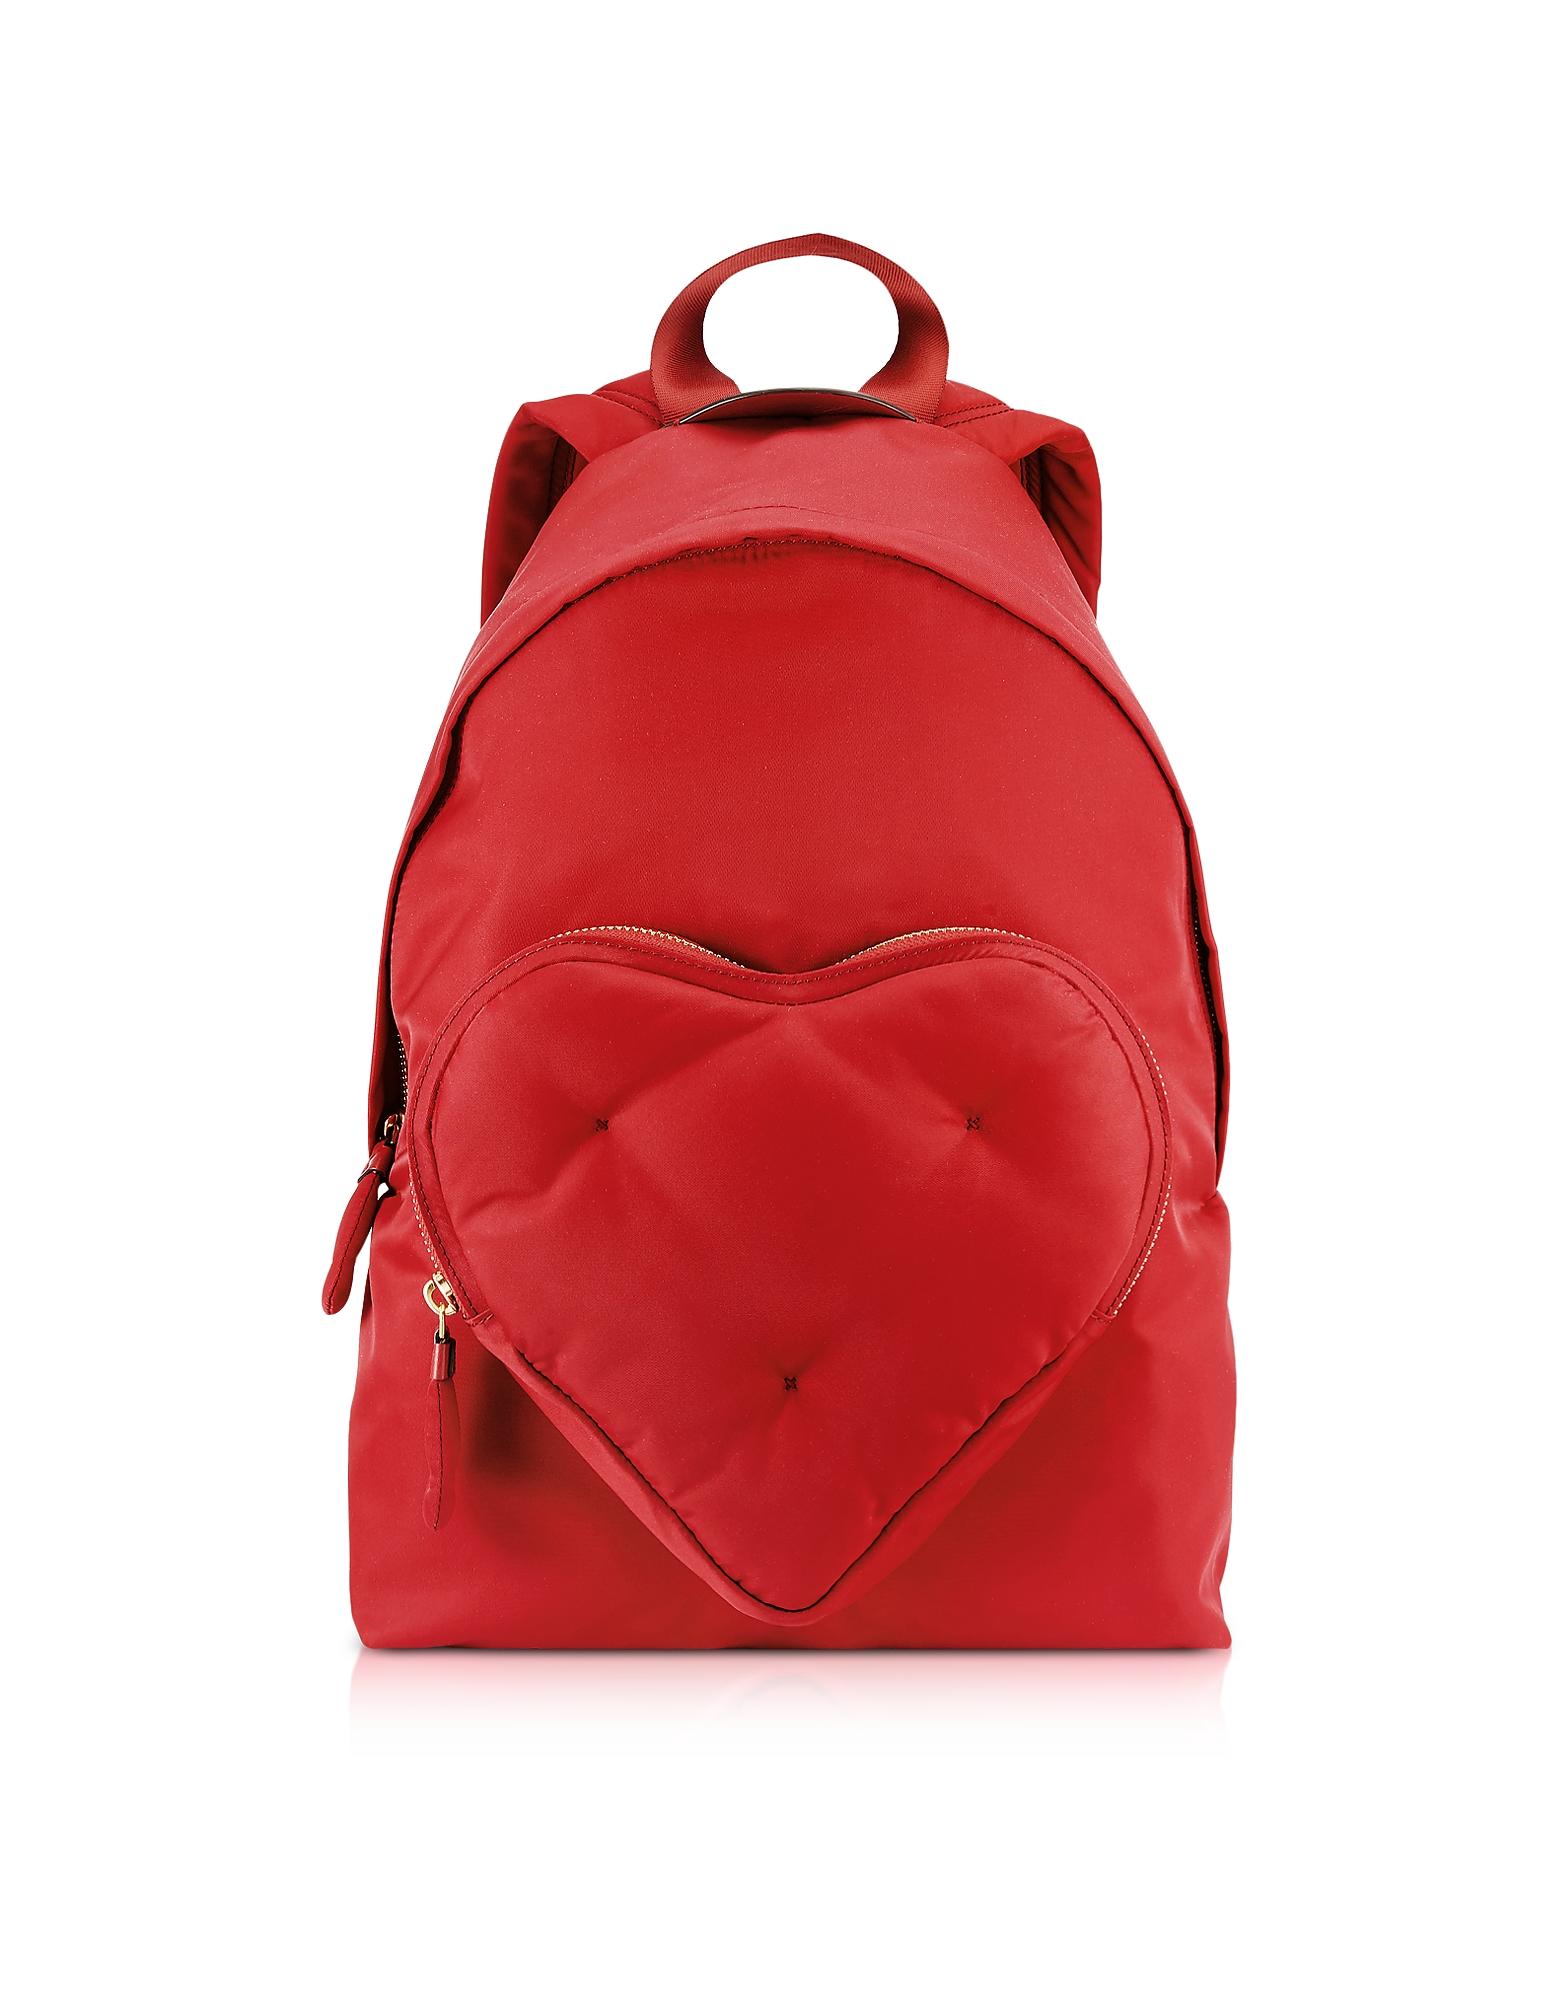 Image of Anya Hindmarch Designer Handbags, Red Nylon Chubby Heart Backpack